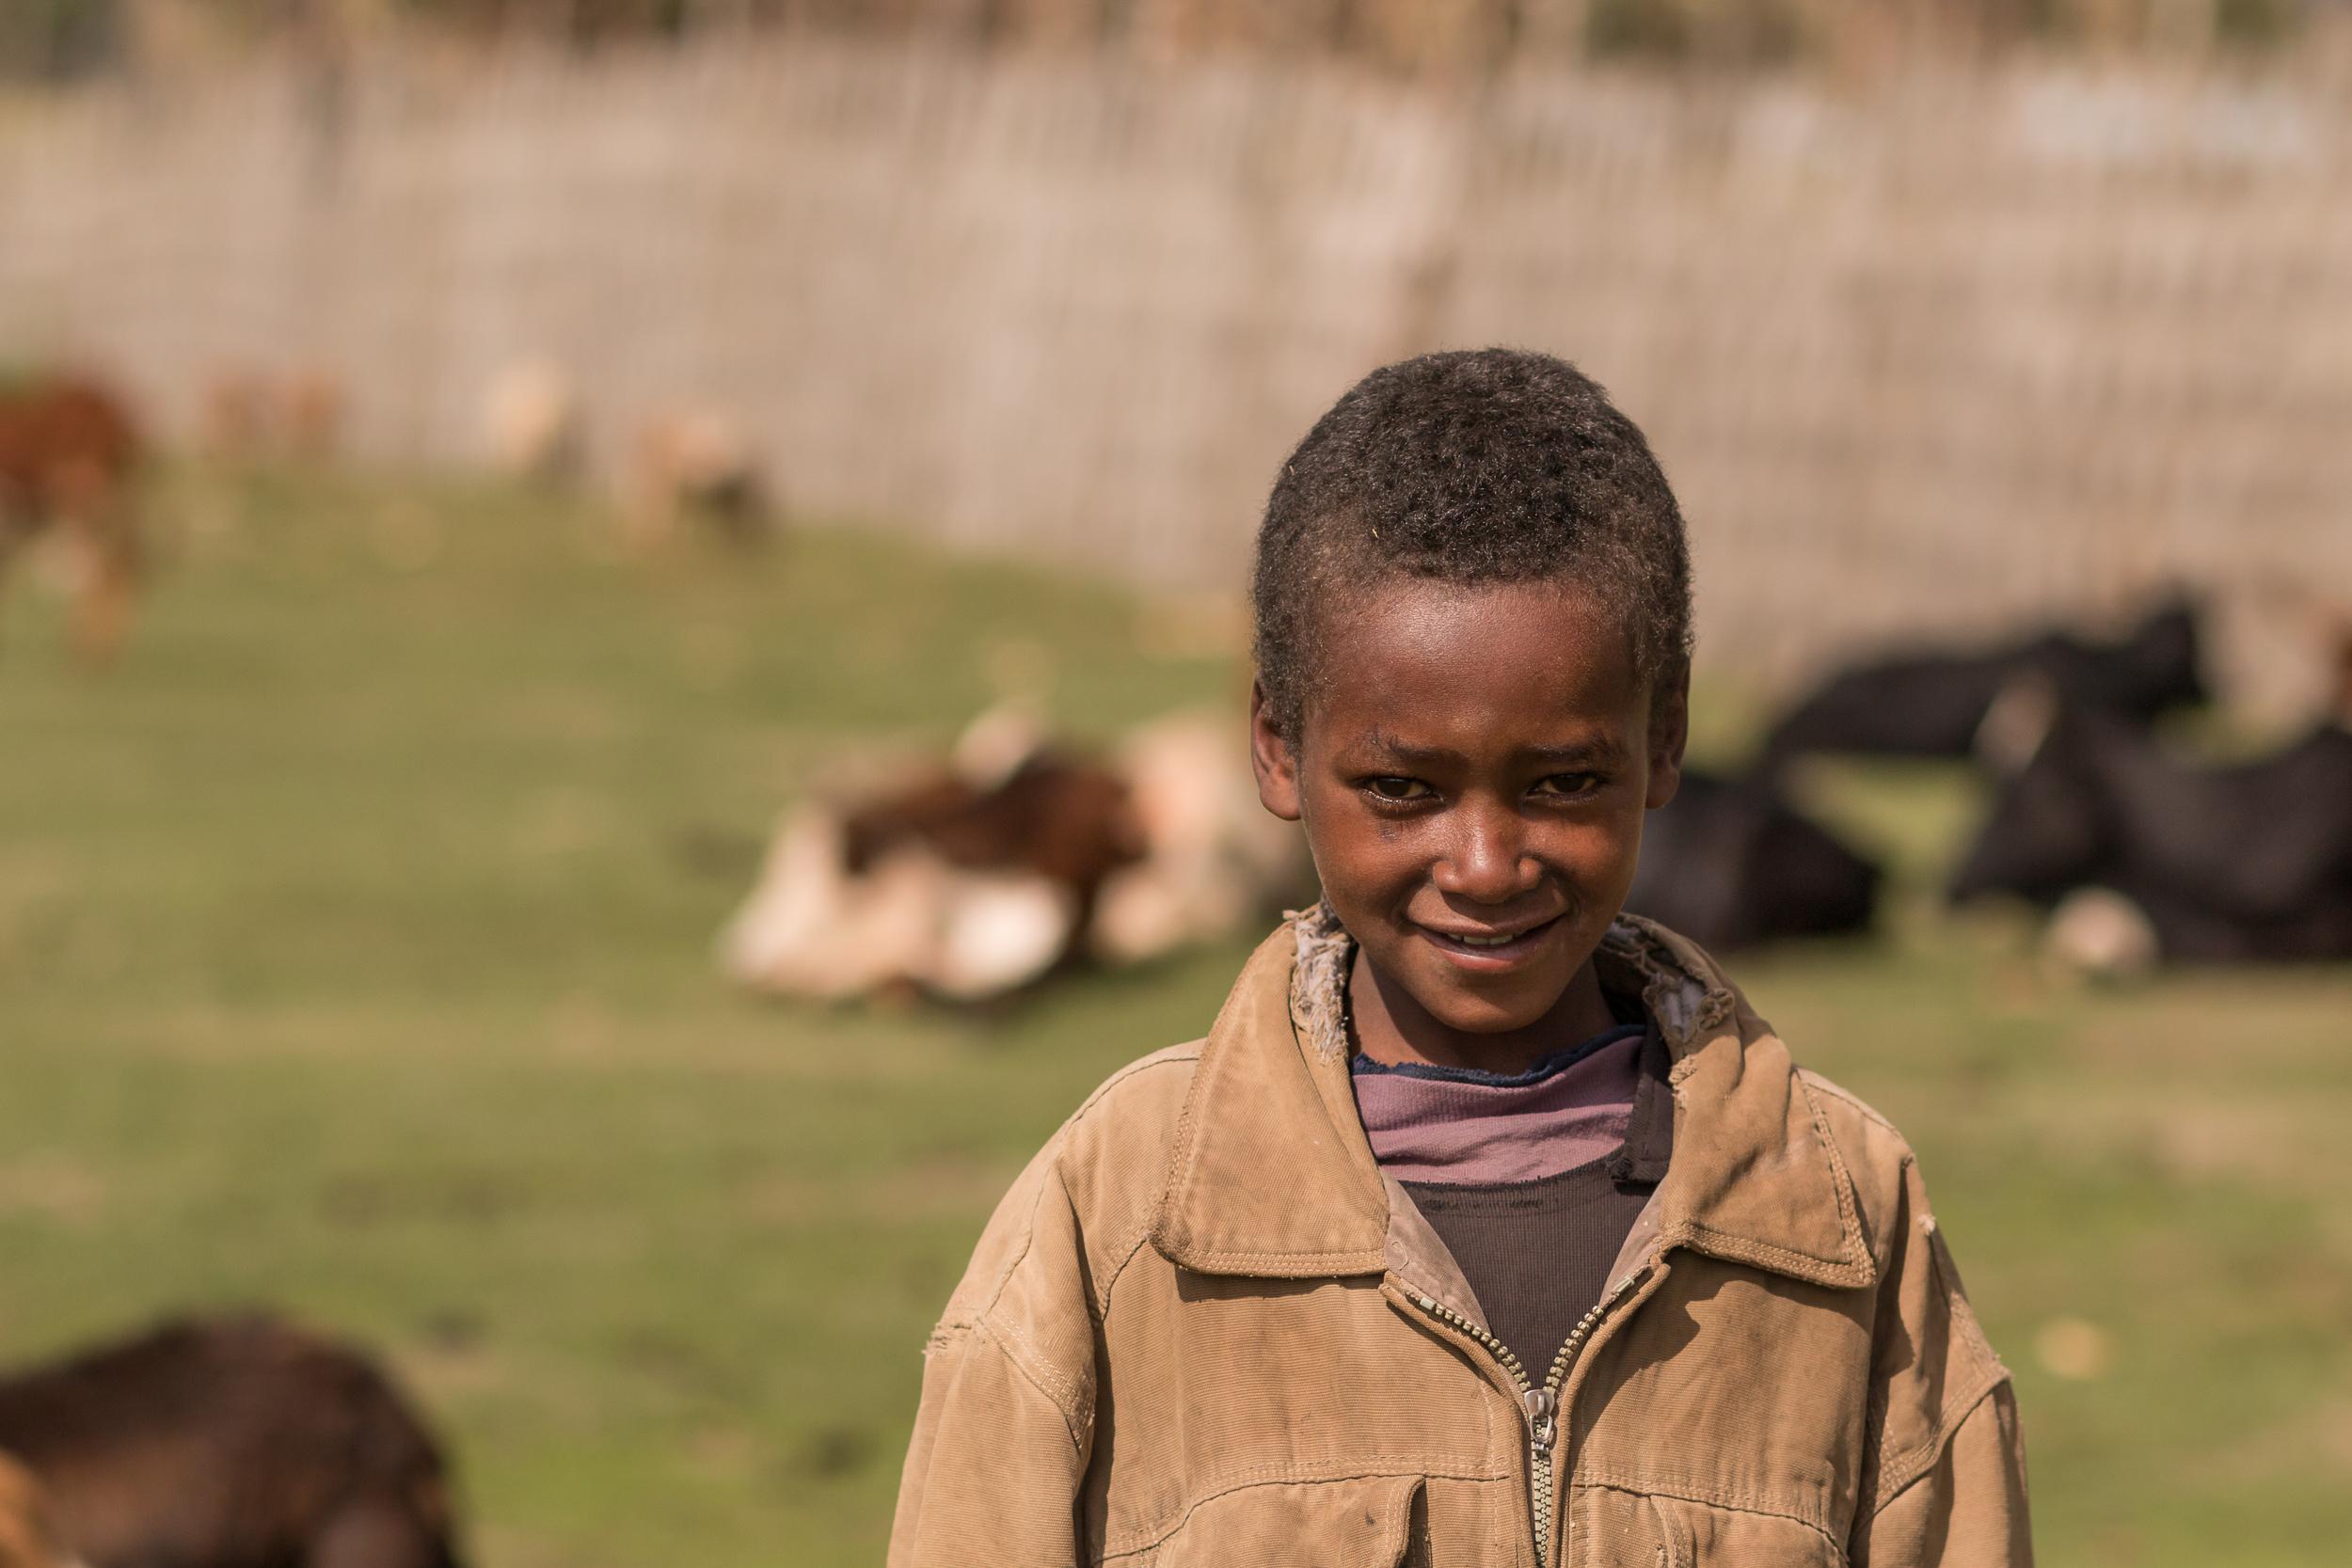 ethiopia_portraits-8765.JPG